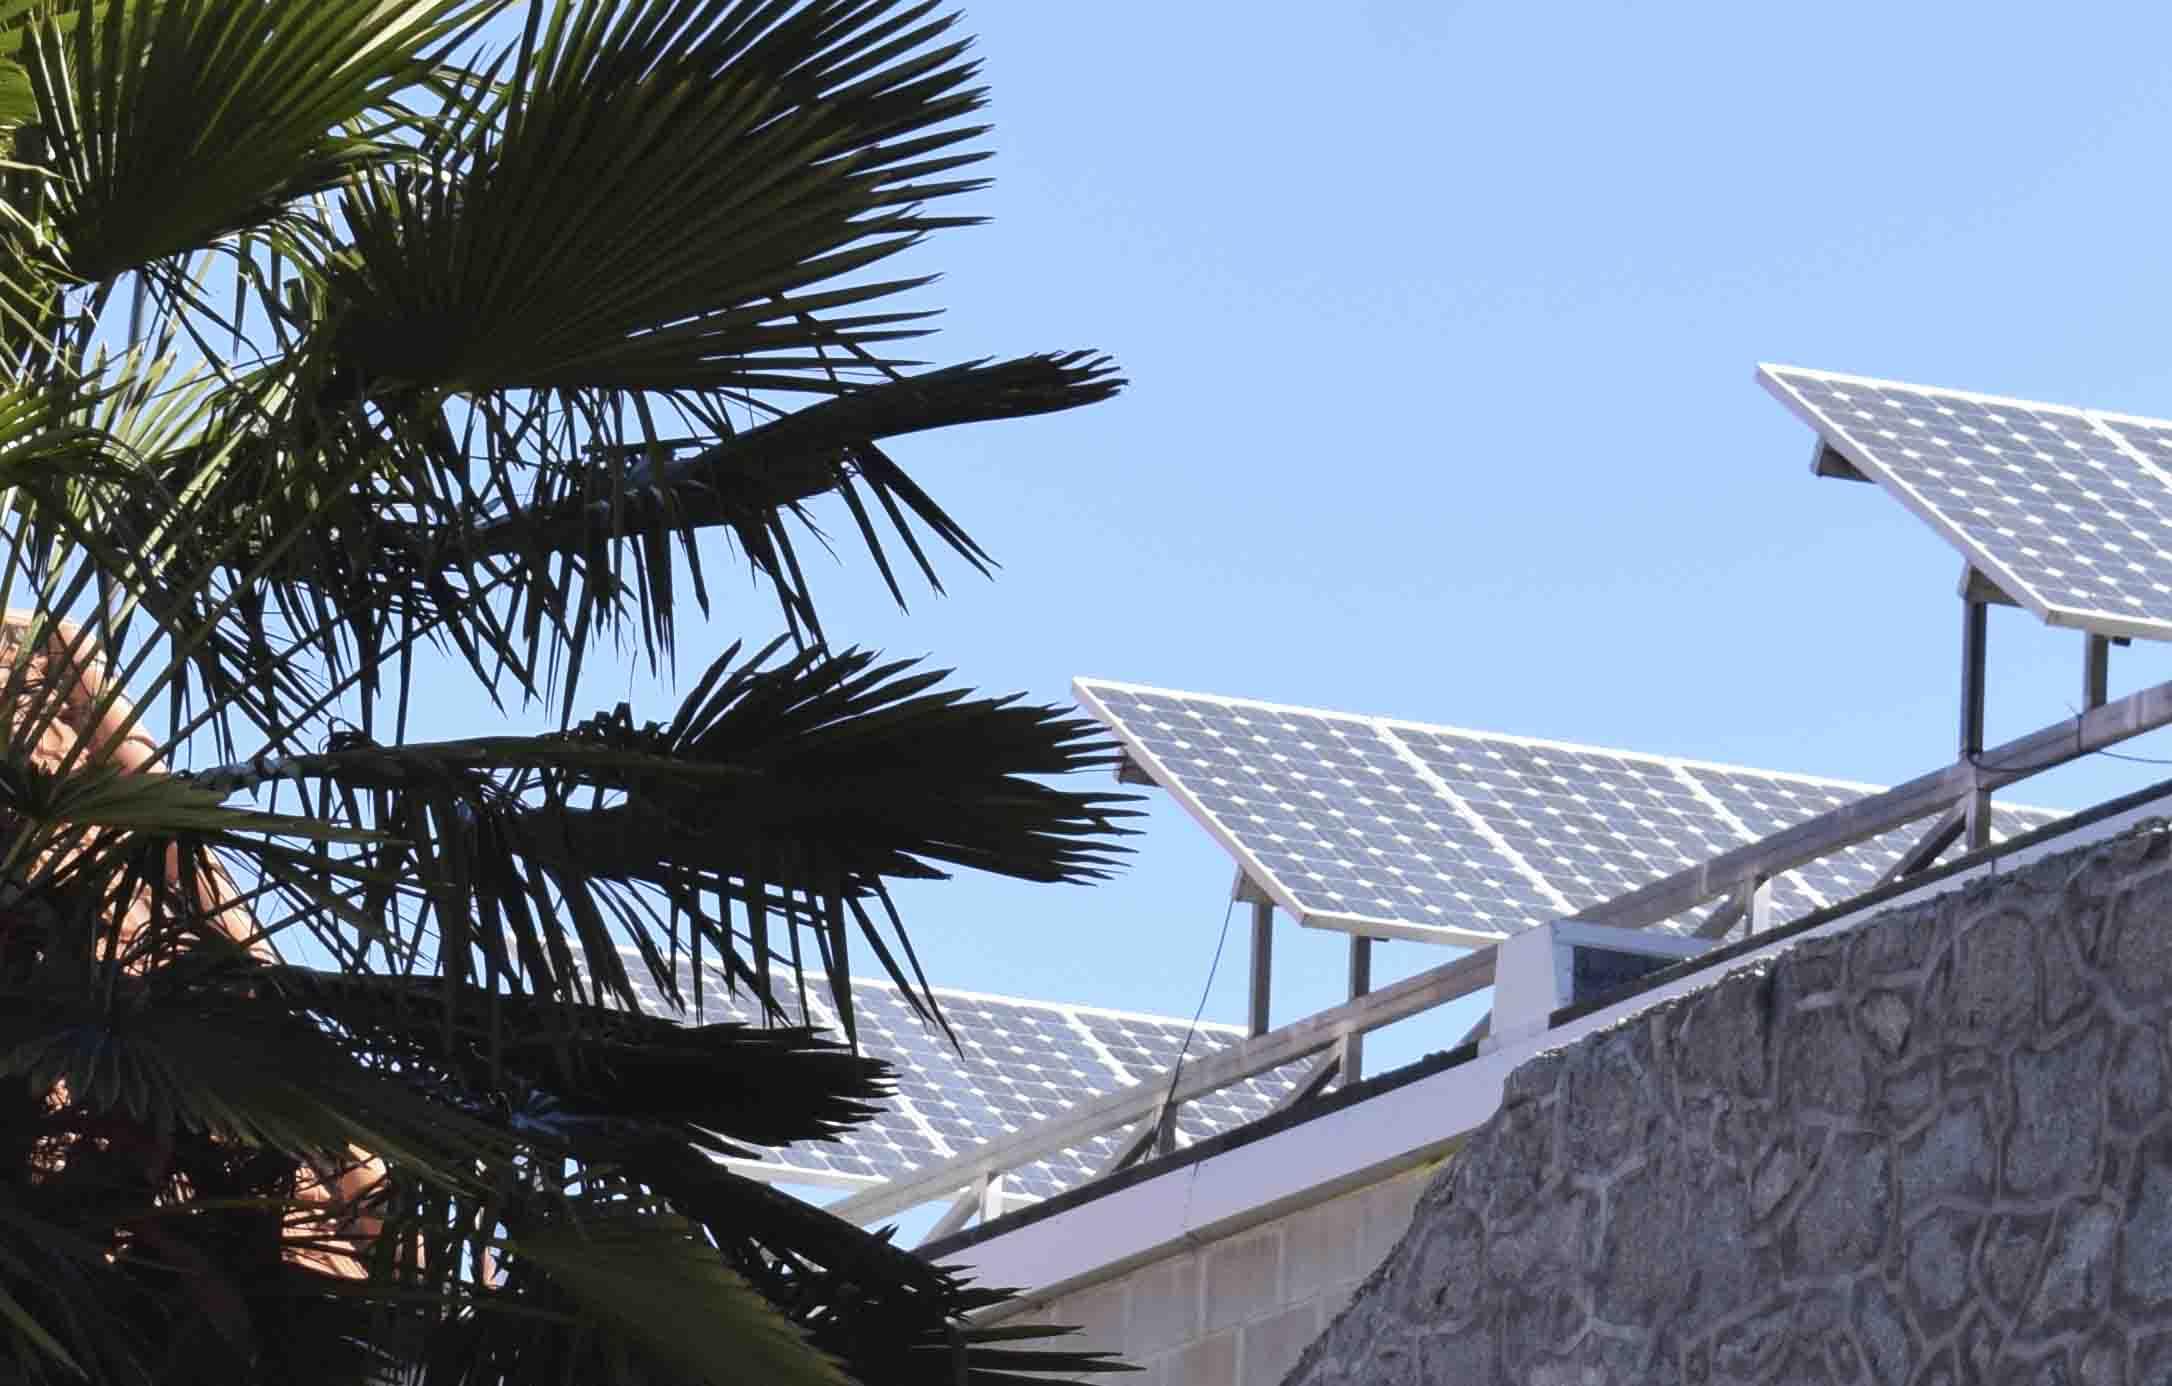 Suministro e instalacion de placas solares sobre cubierta plana